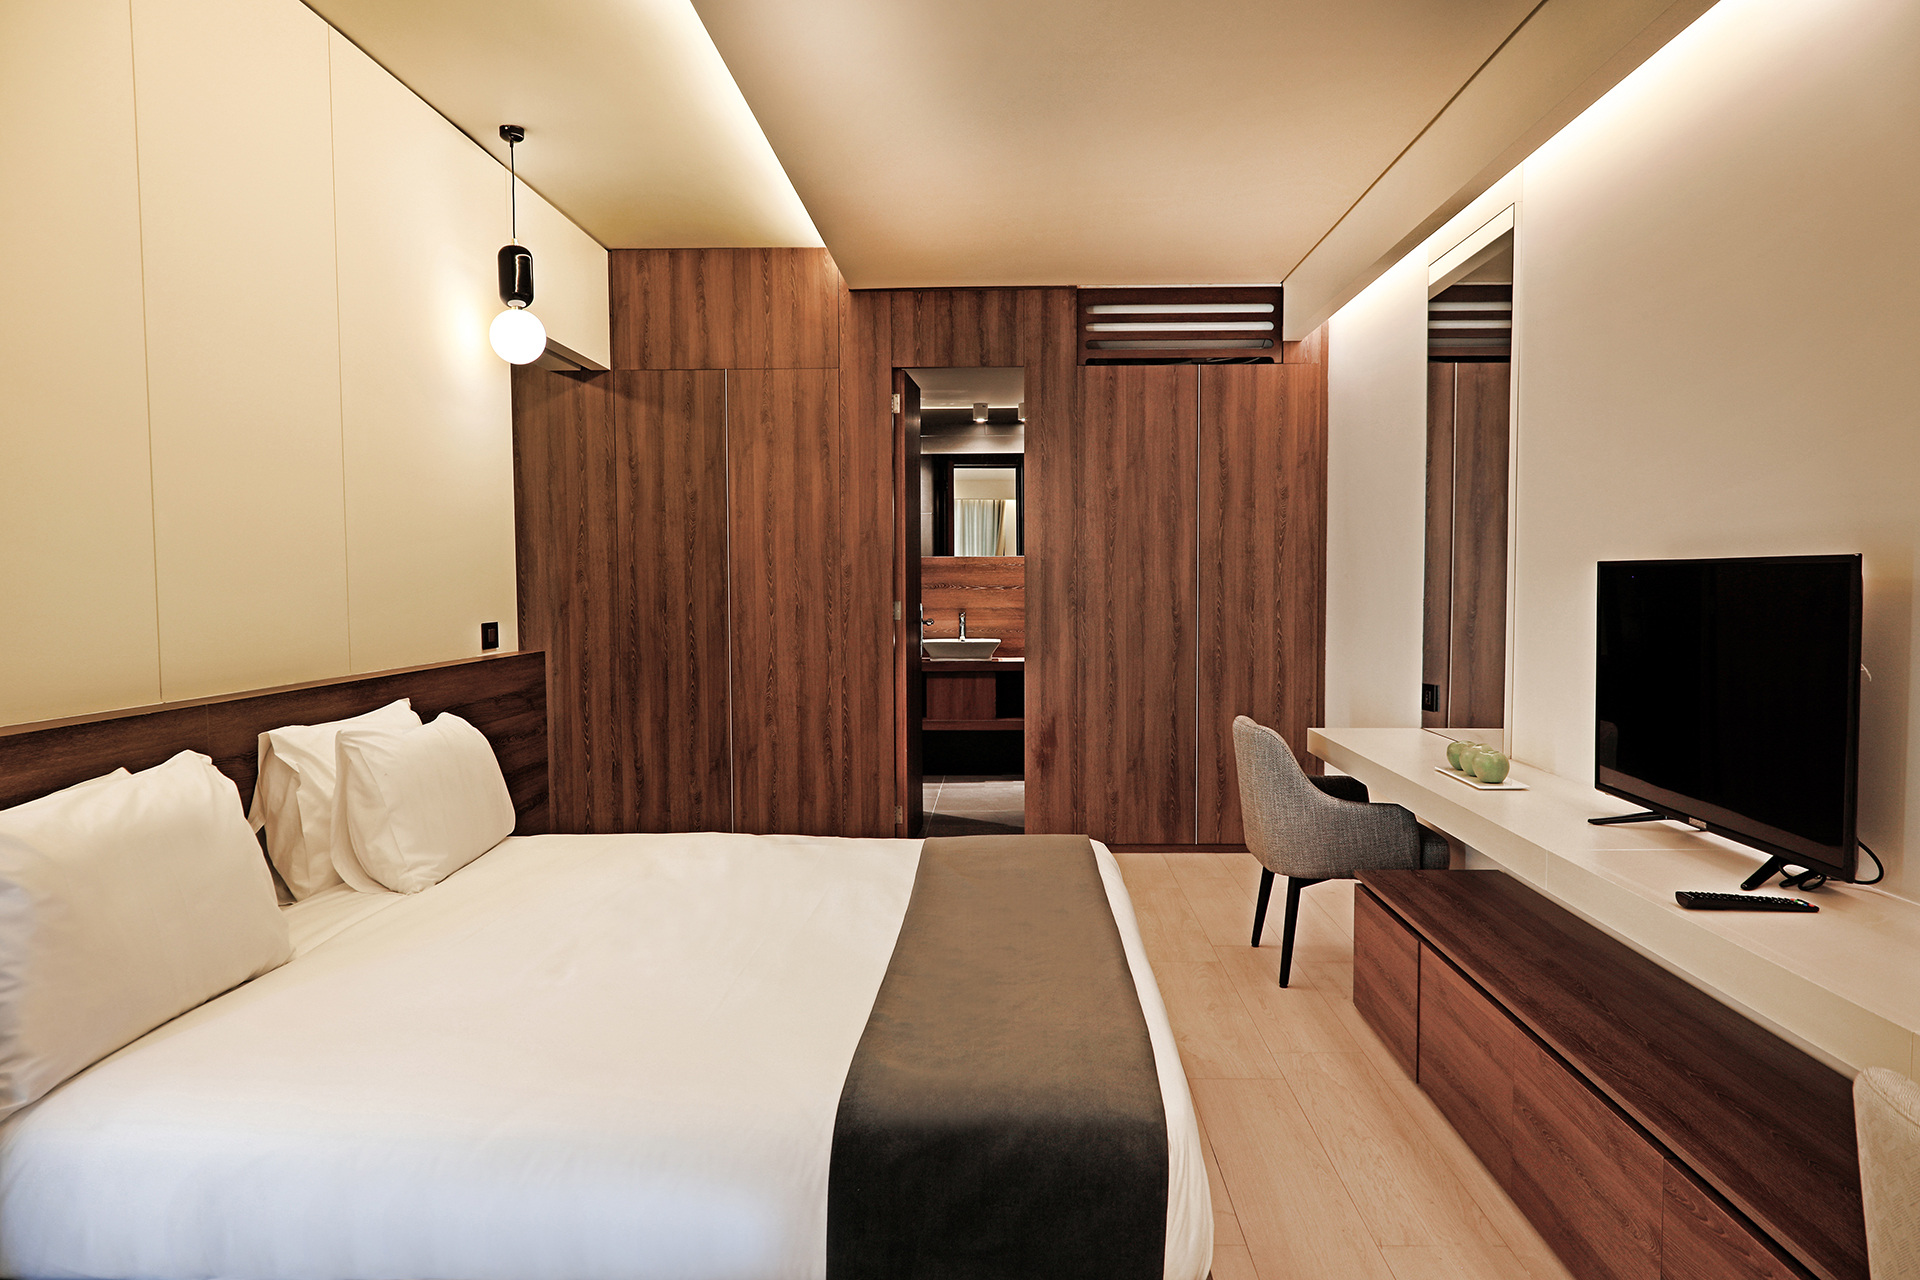 Le-Pave-Hotel-Lebanon-Beirut-7